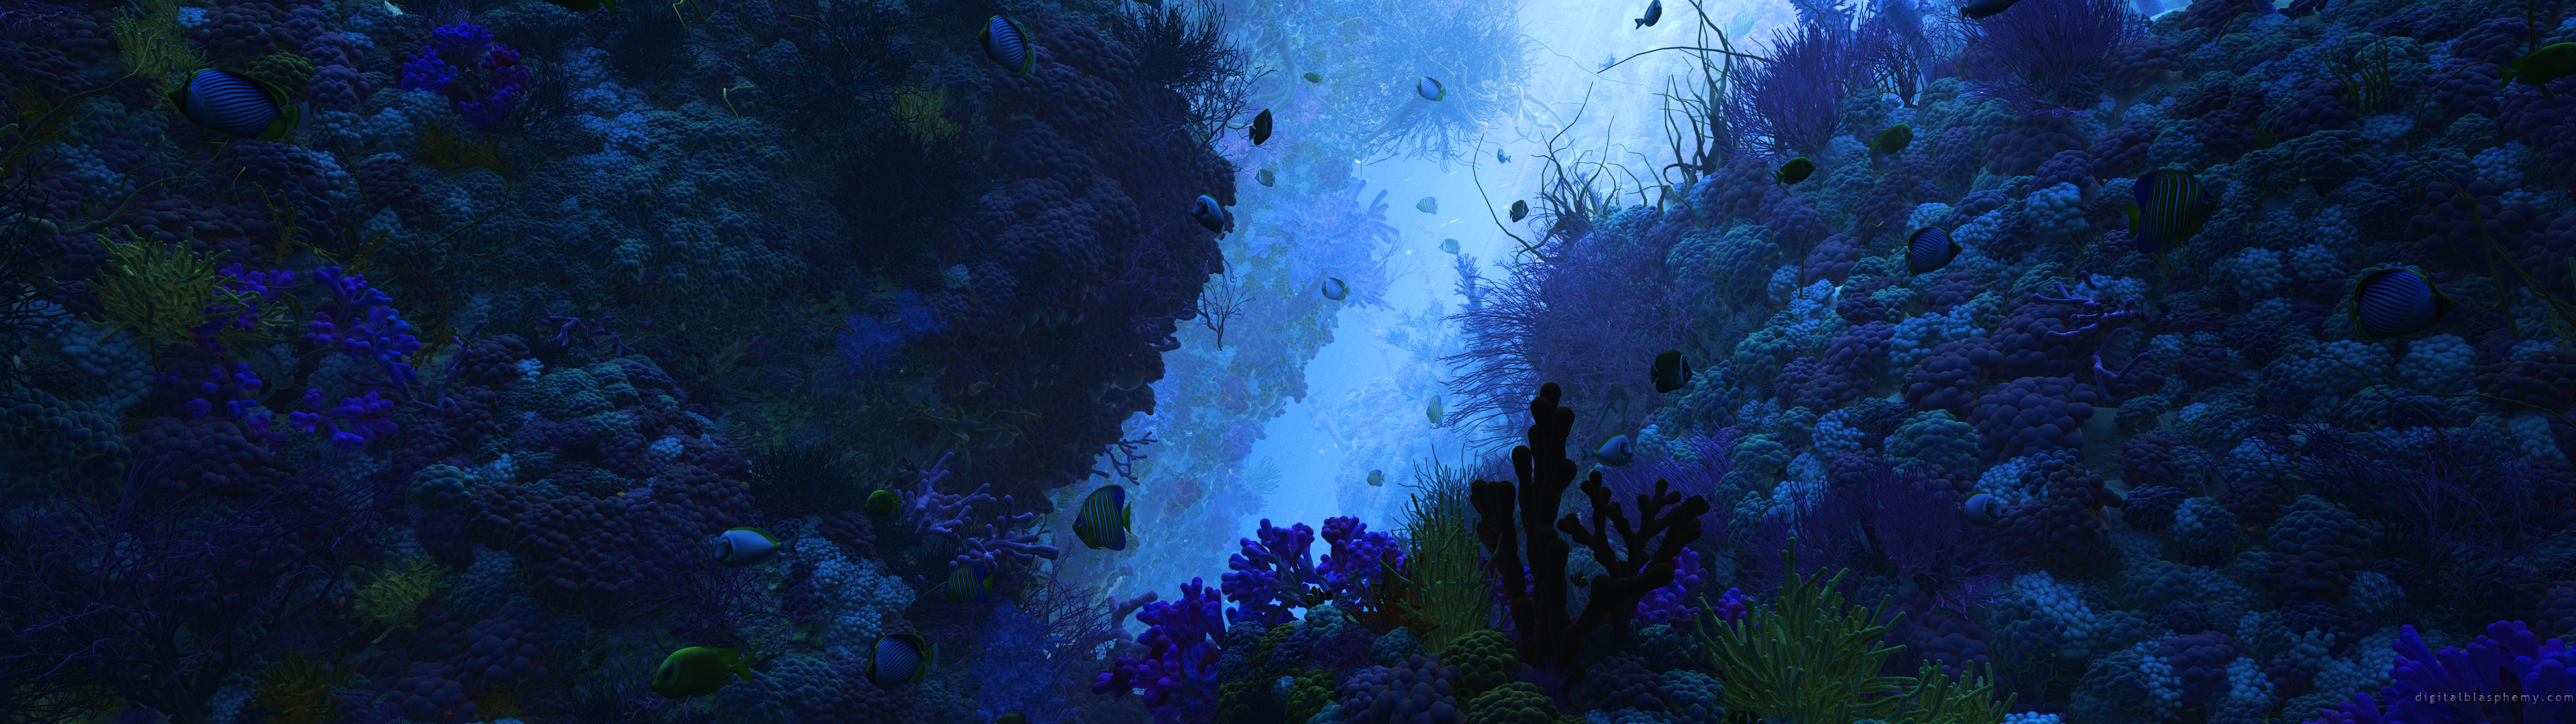 Background image 3840x1080 - Multi Monitor Ocean Wallpaper